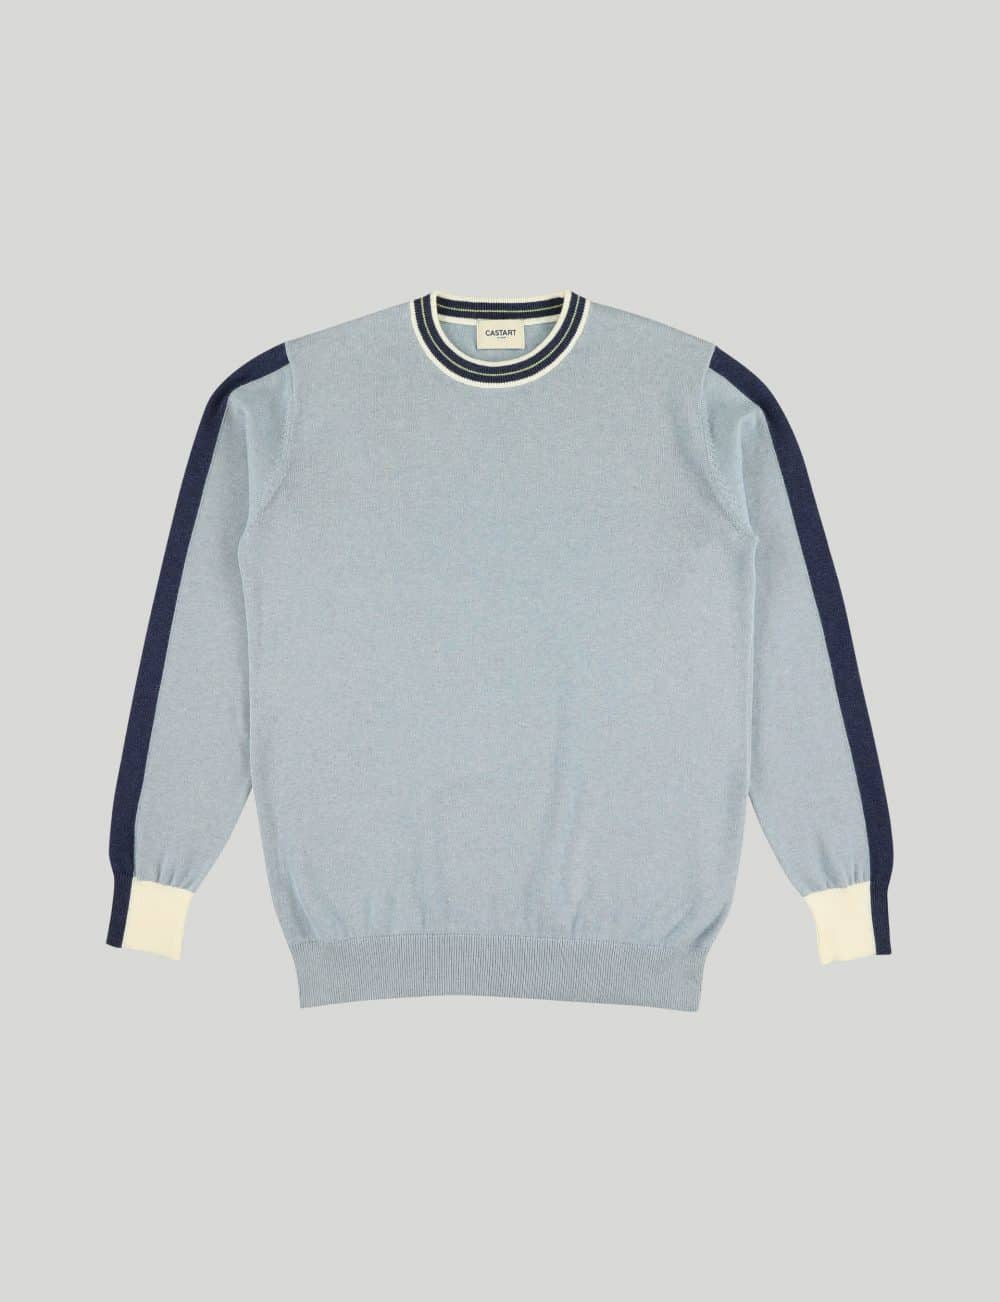 Castart - Sunbuddy knitwear - Light Blue